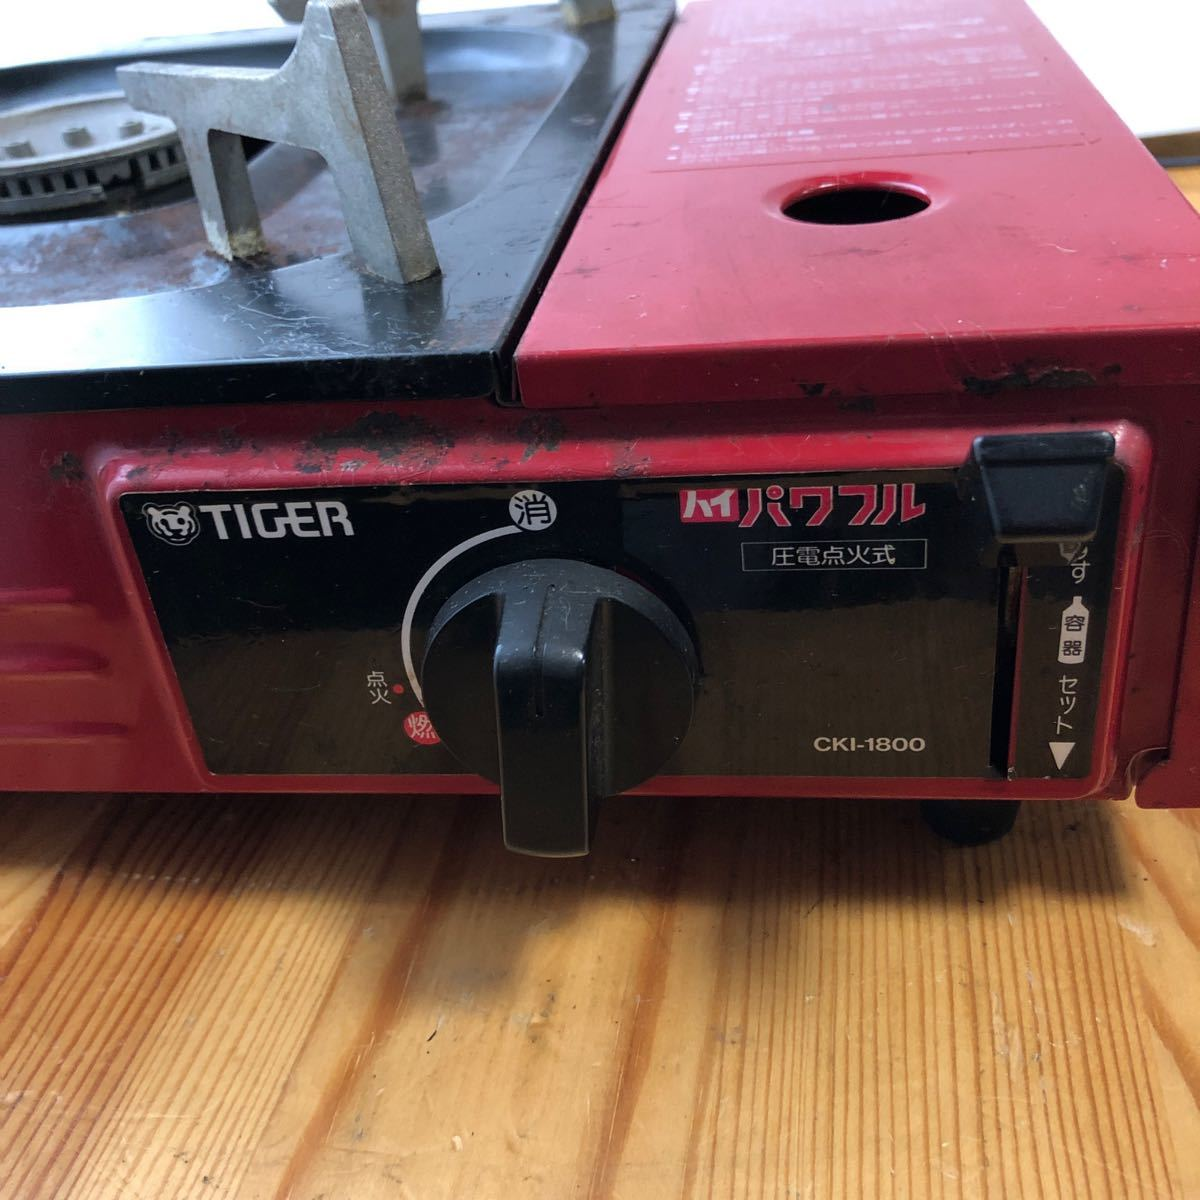 TIGER タイガー パワフル ガスコンロ カセットコンロ CKI-1800